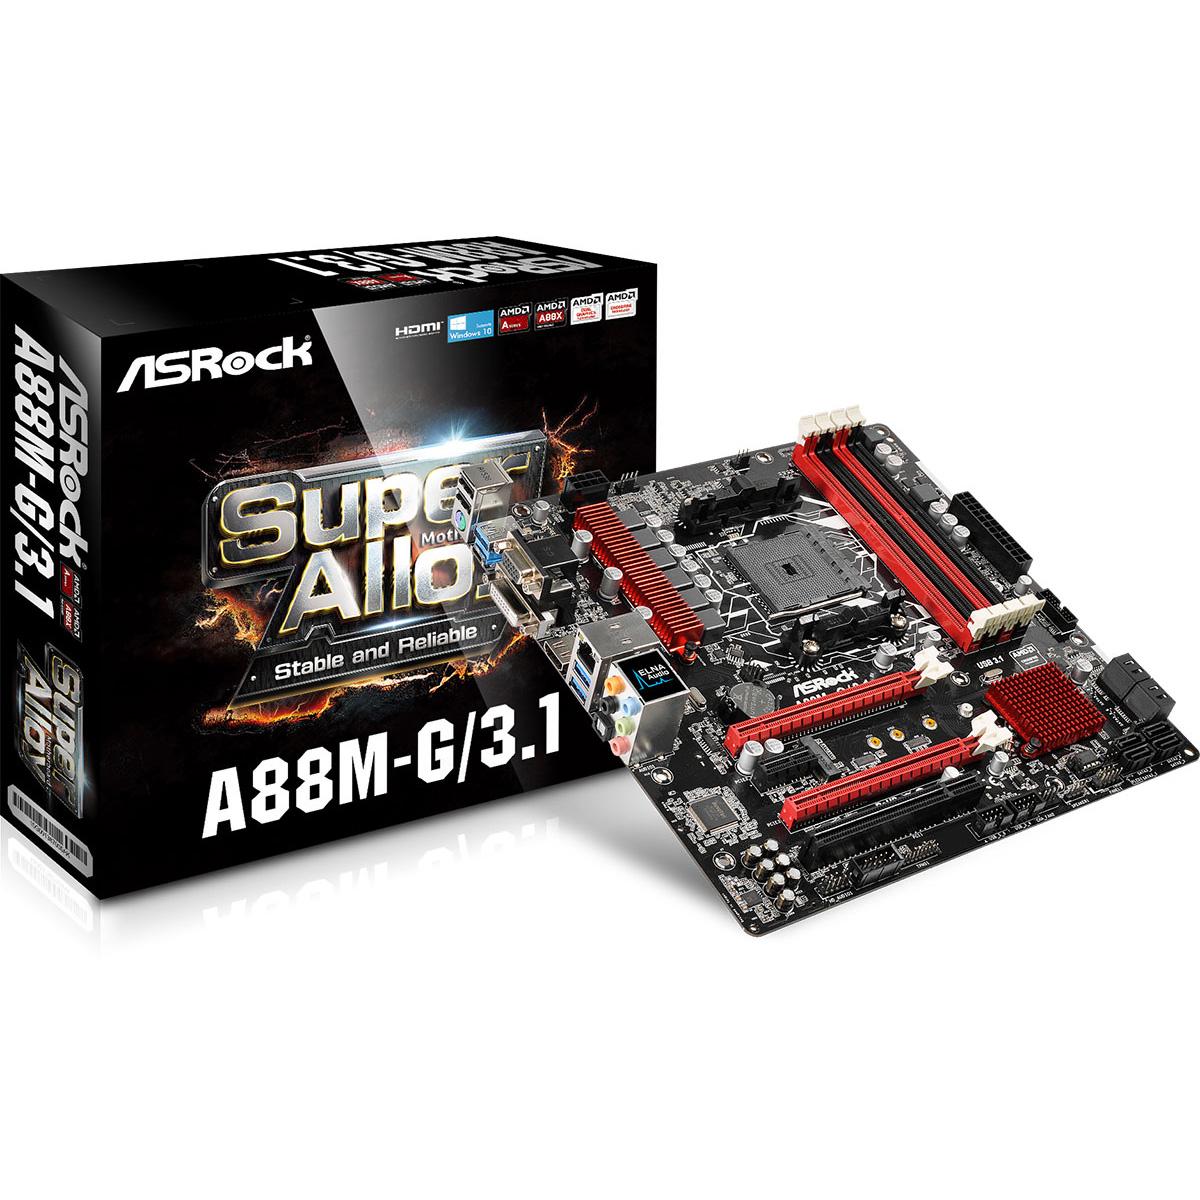 Carte mère ASRock A88M-G/3.1 Carte mère Micro ATX Socket FM2+ AMD A88X - SATA 6 Gbps - USB 3.1 - 2x PCI-Express 3.0 16x